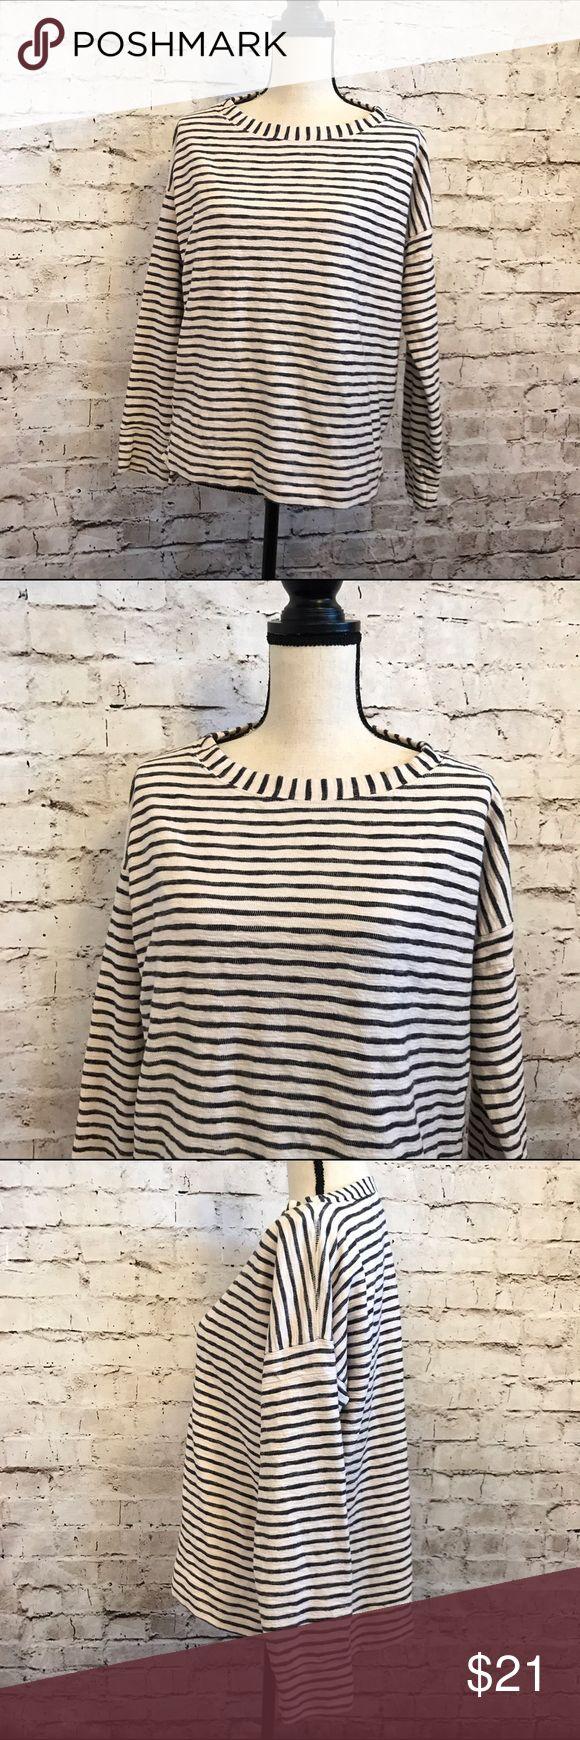 "Madewell Sweatshirt Navy Blue Cream Stripe Medium Gently worn great versatile top. No real signs of wear. Medium. 100% cotton. Crew neck. Approx measurements: bust-44"" length-front 22"" back 24"" Madewell Tops Sweatshirts & Hoodies"